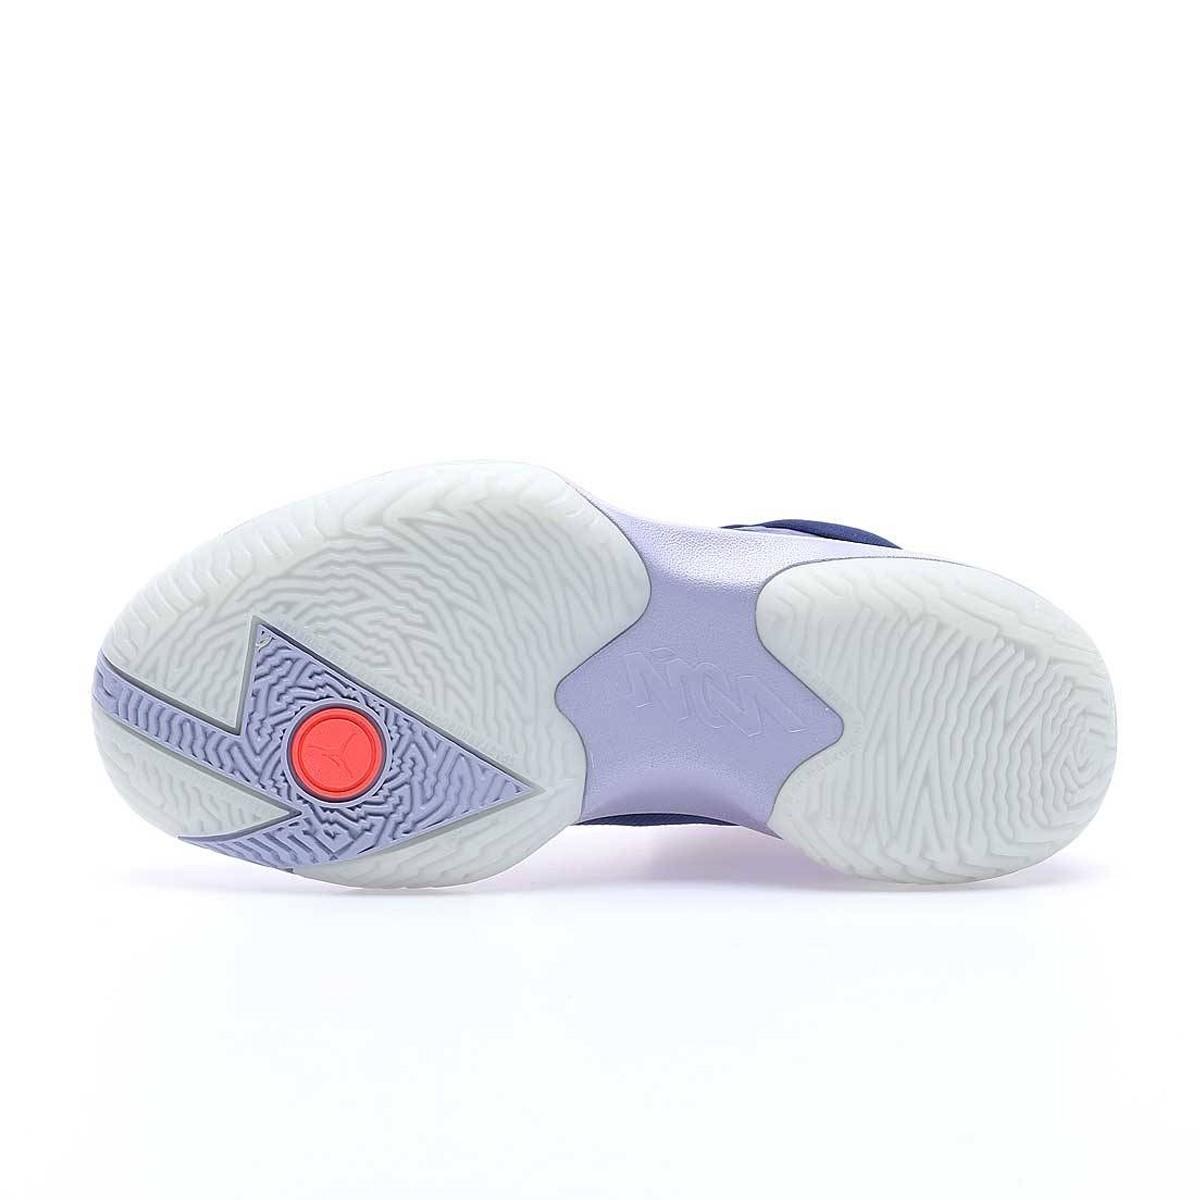 Jordan Zion 1 JR 'Purple'-DA3131-400